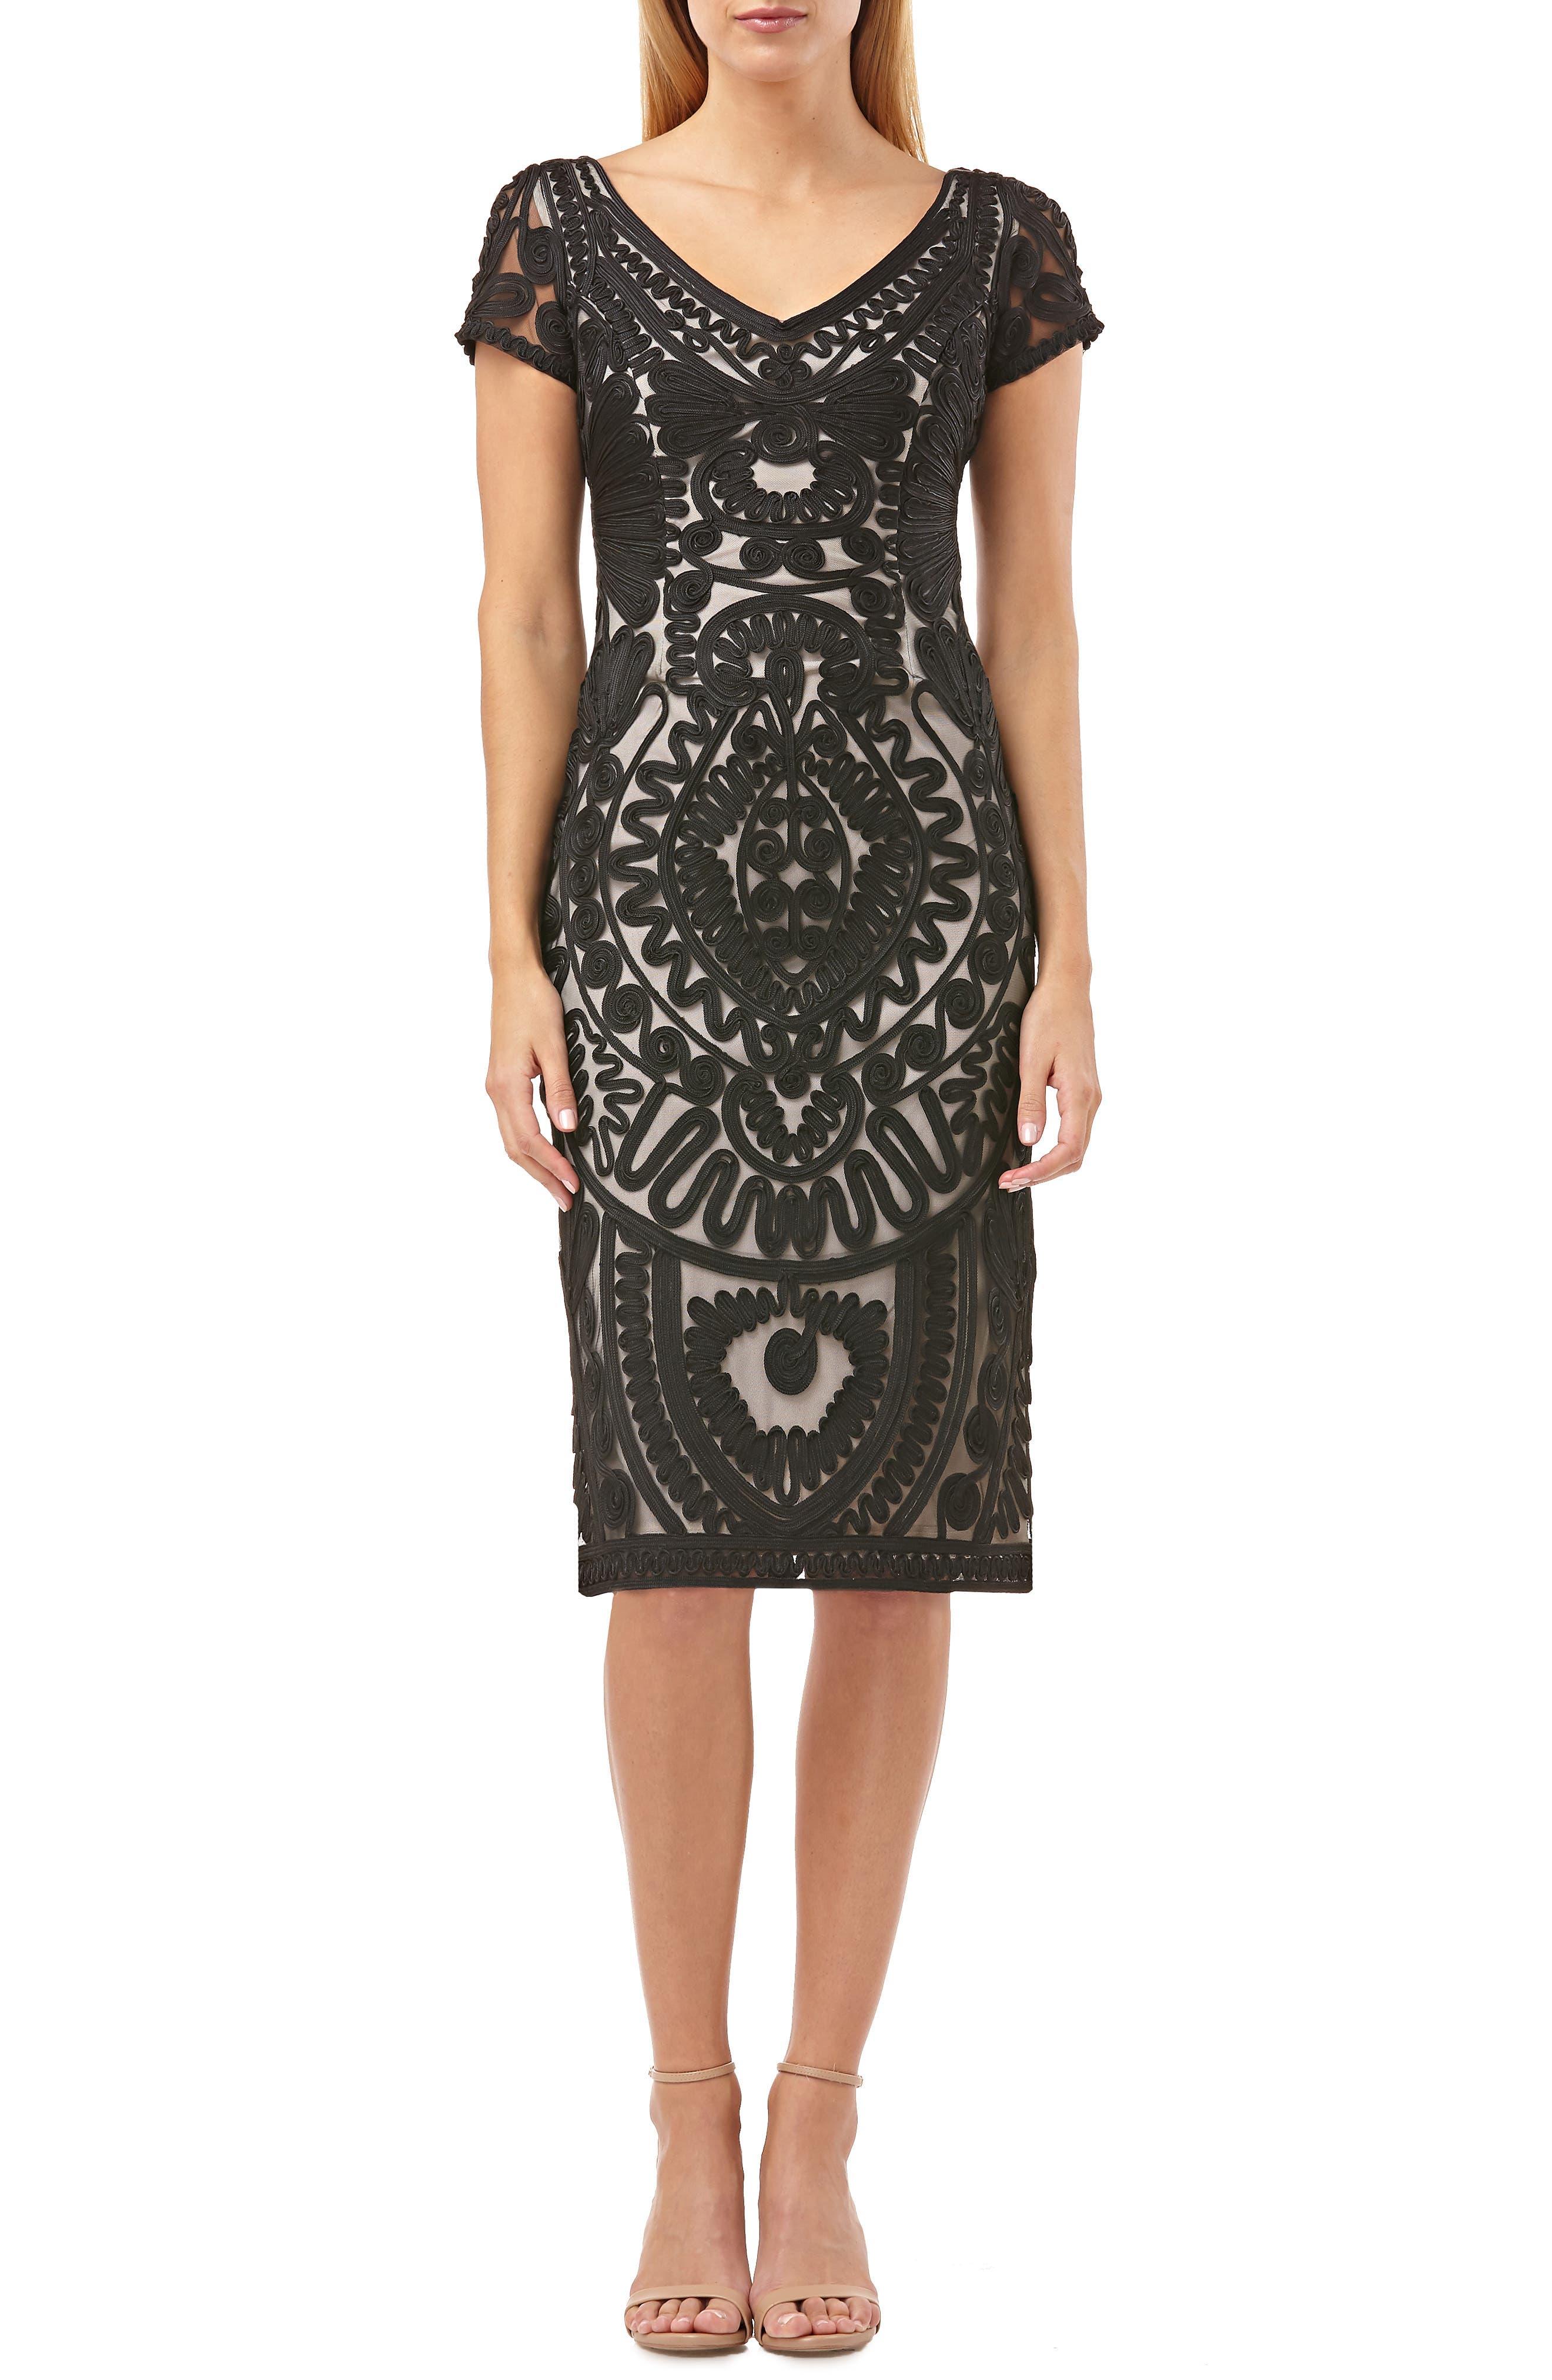 Short Sleeve Soutache Mesh Cocktail Dress,                             Main thumbnail 1, color,                             BLACK/ VANILLA